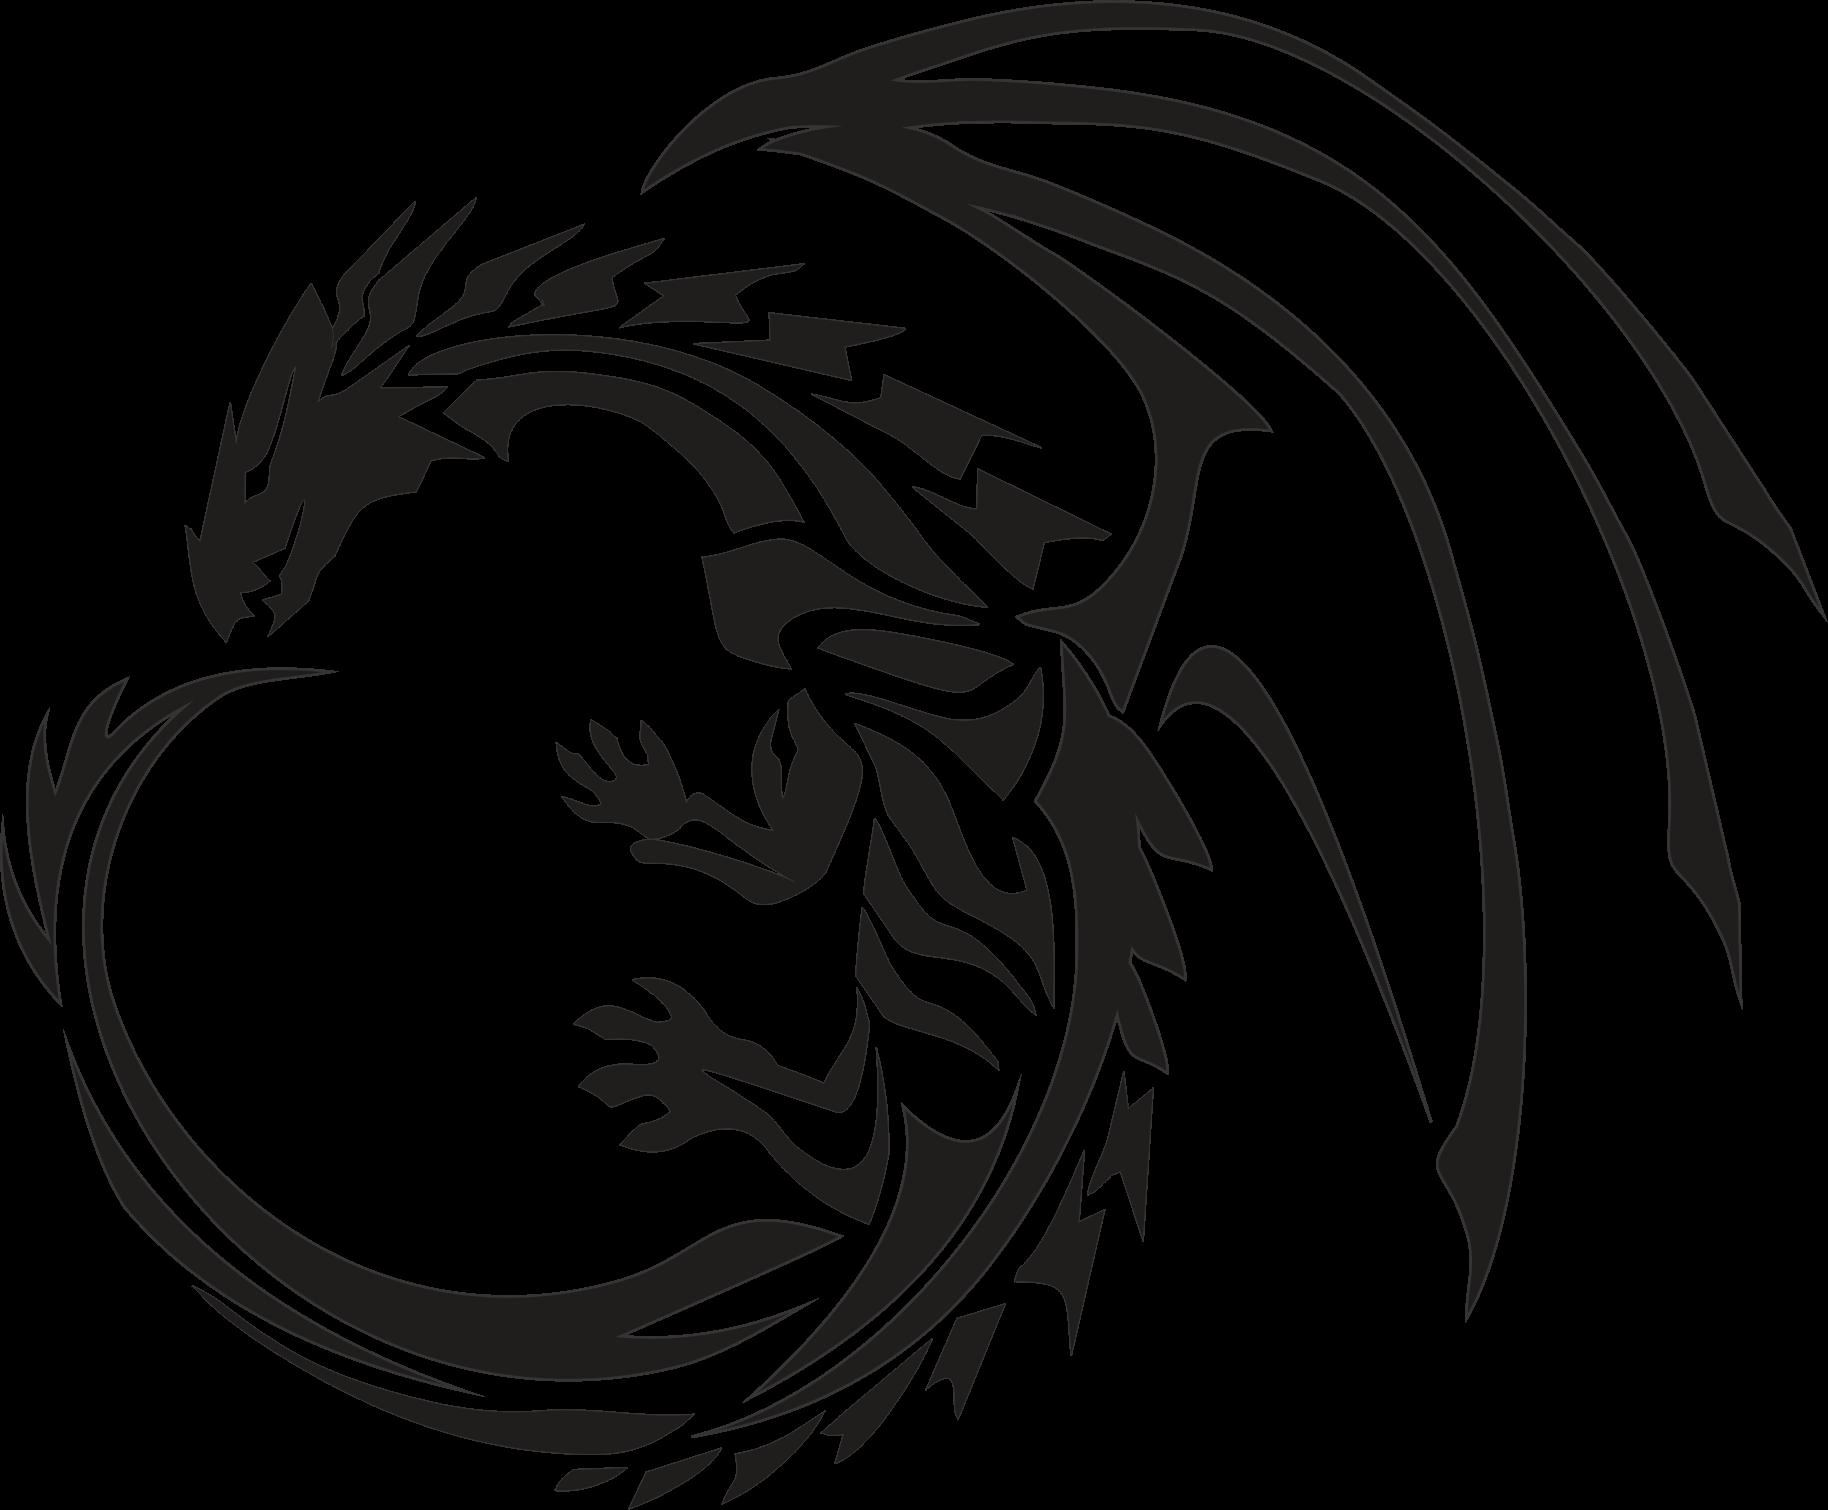 1828x1510 Circle Dragon Tattoo Inspiration